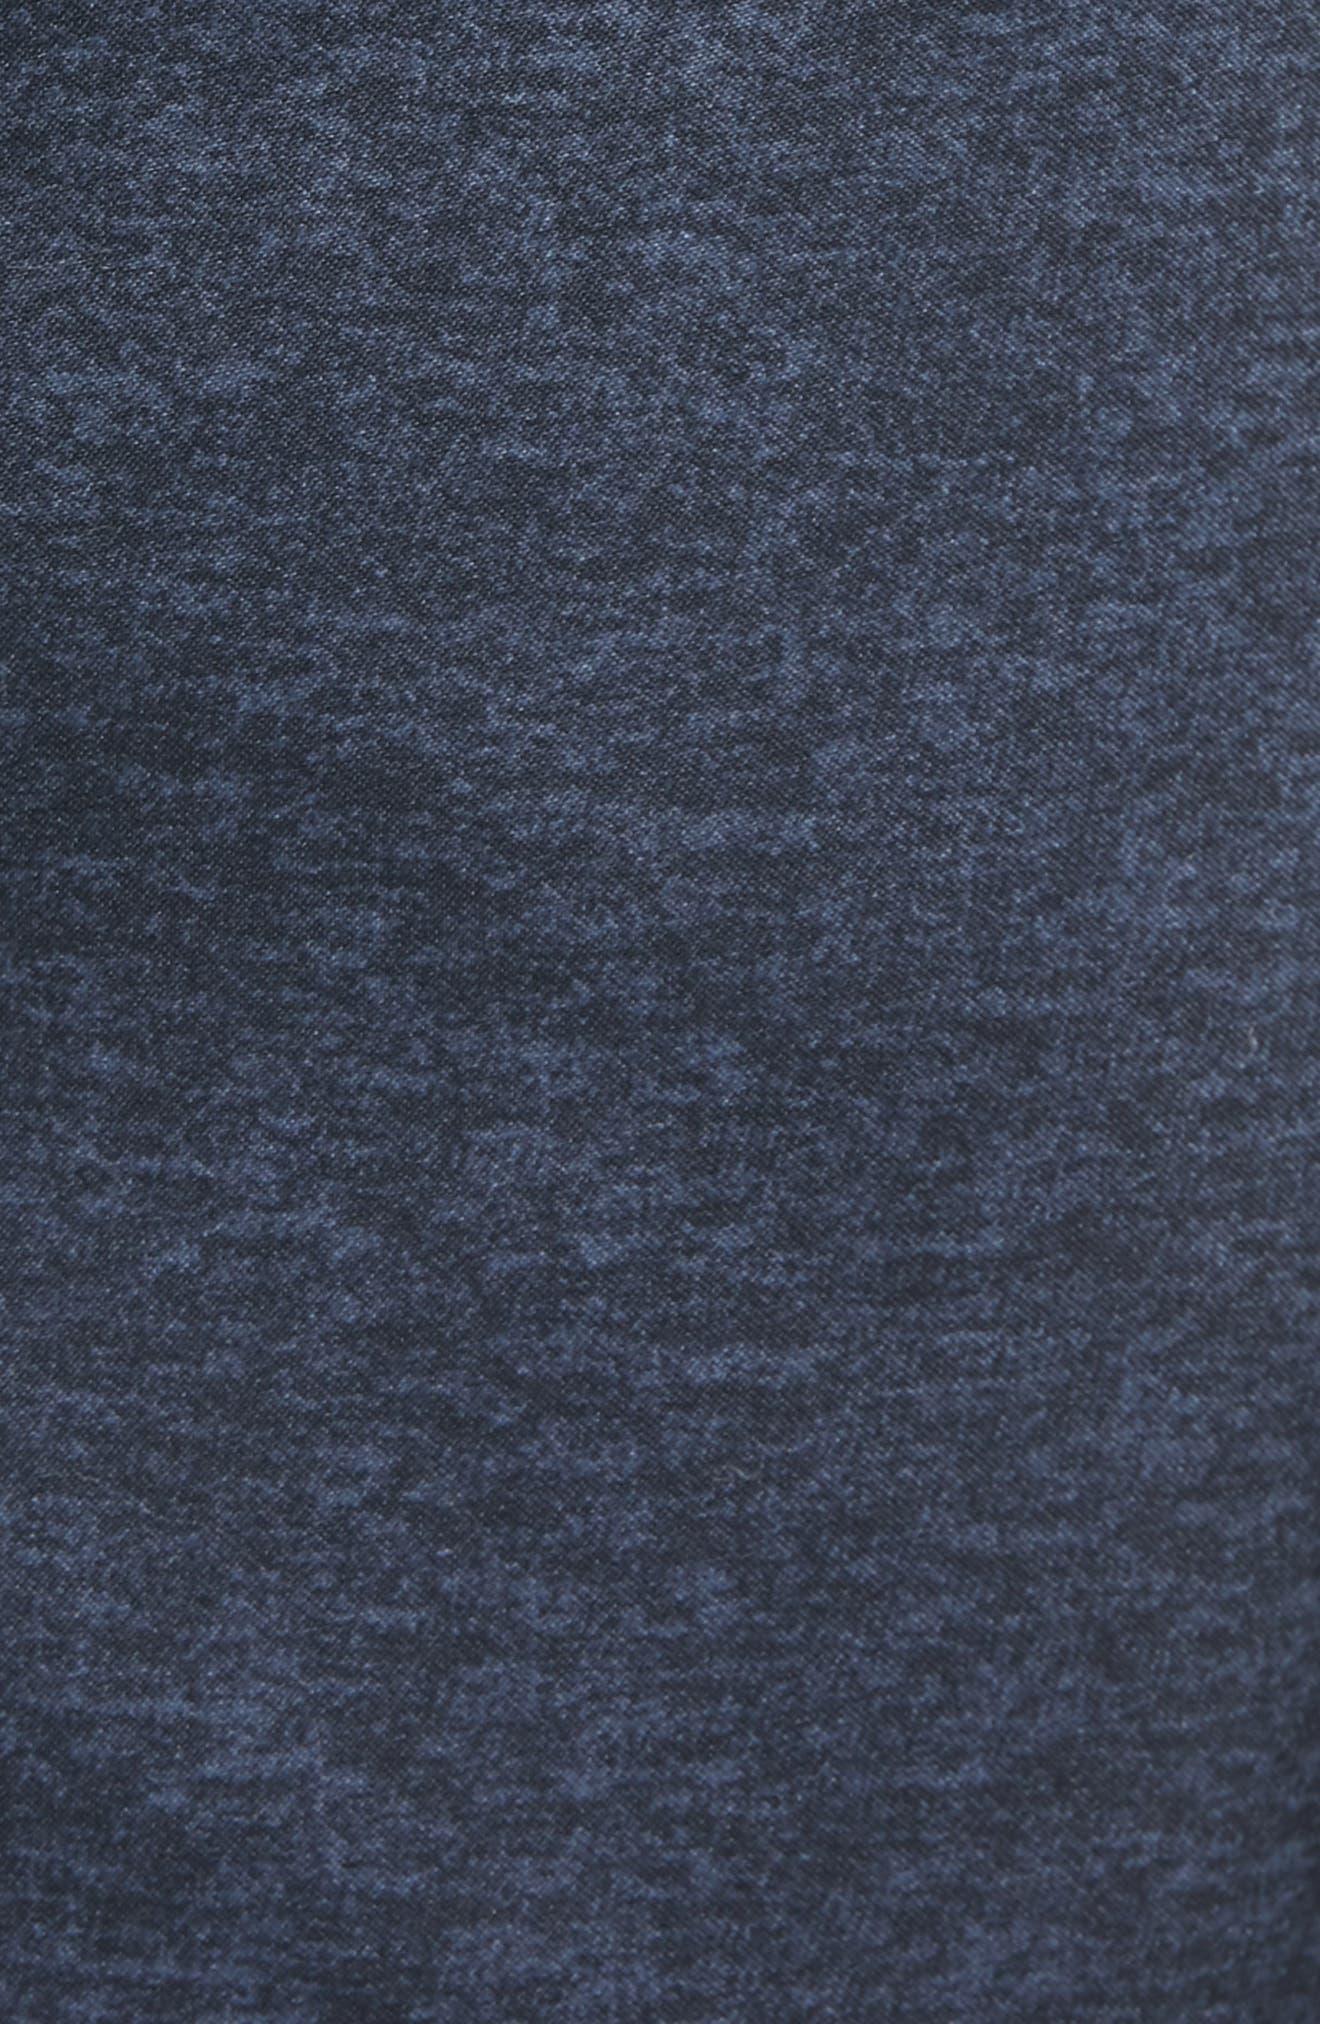 Heathered Colorblock Swim Trunks,                             Alternate thumbnail 5, color,                             Dark Sapphire